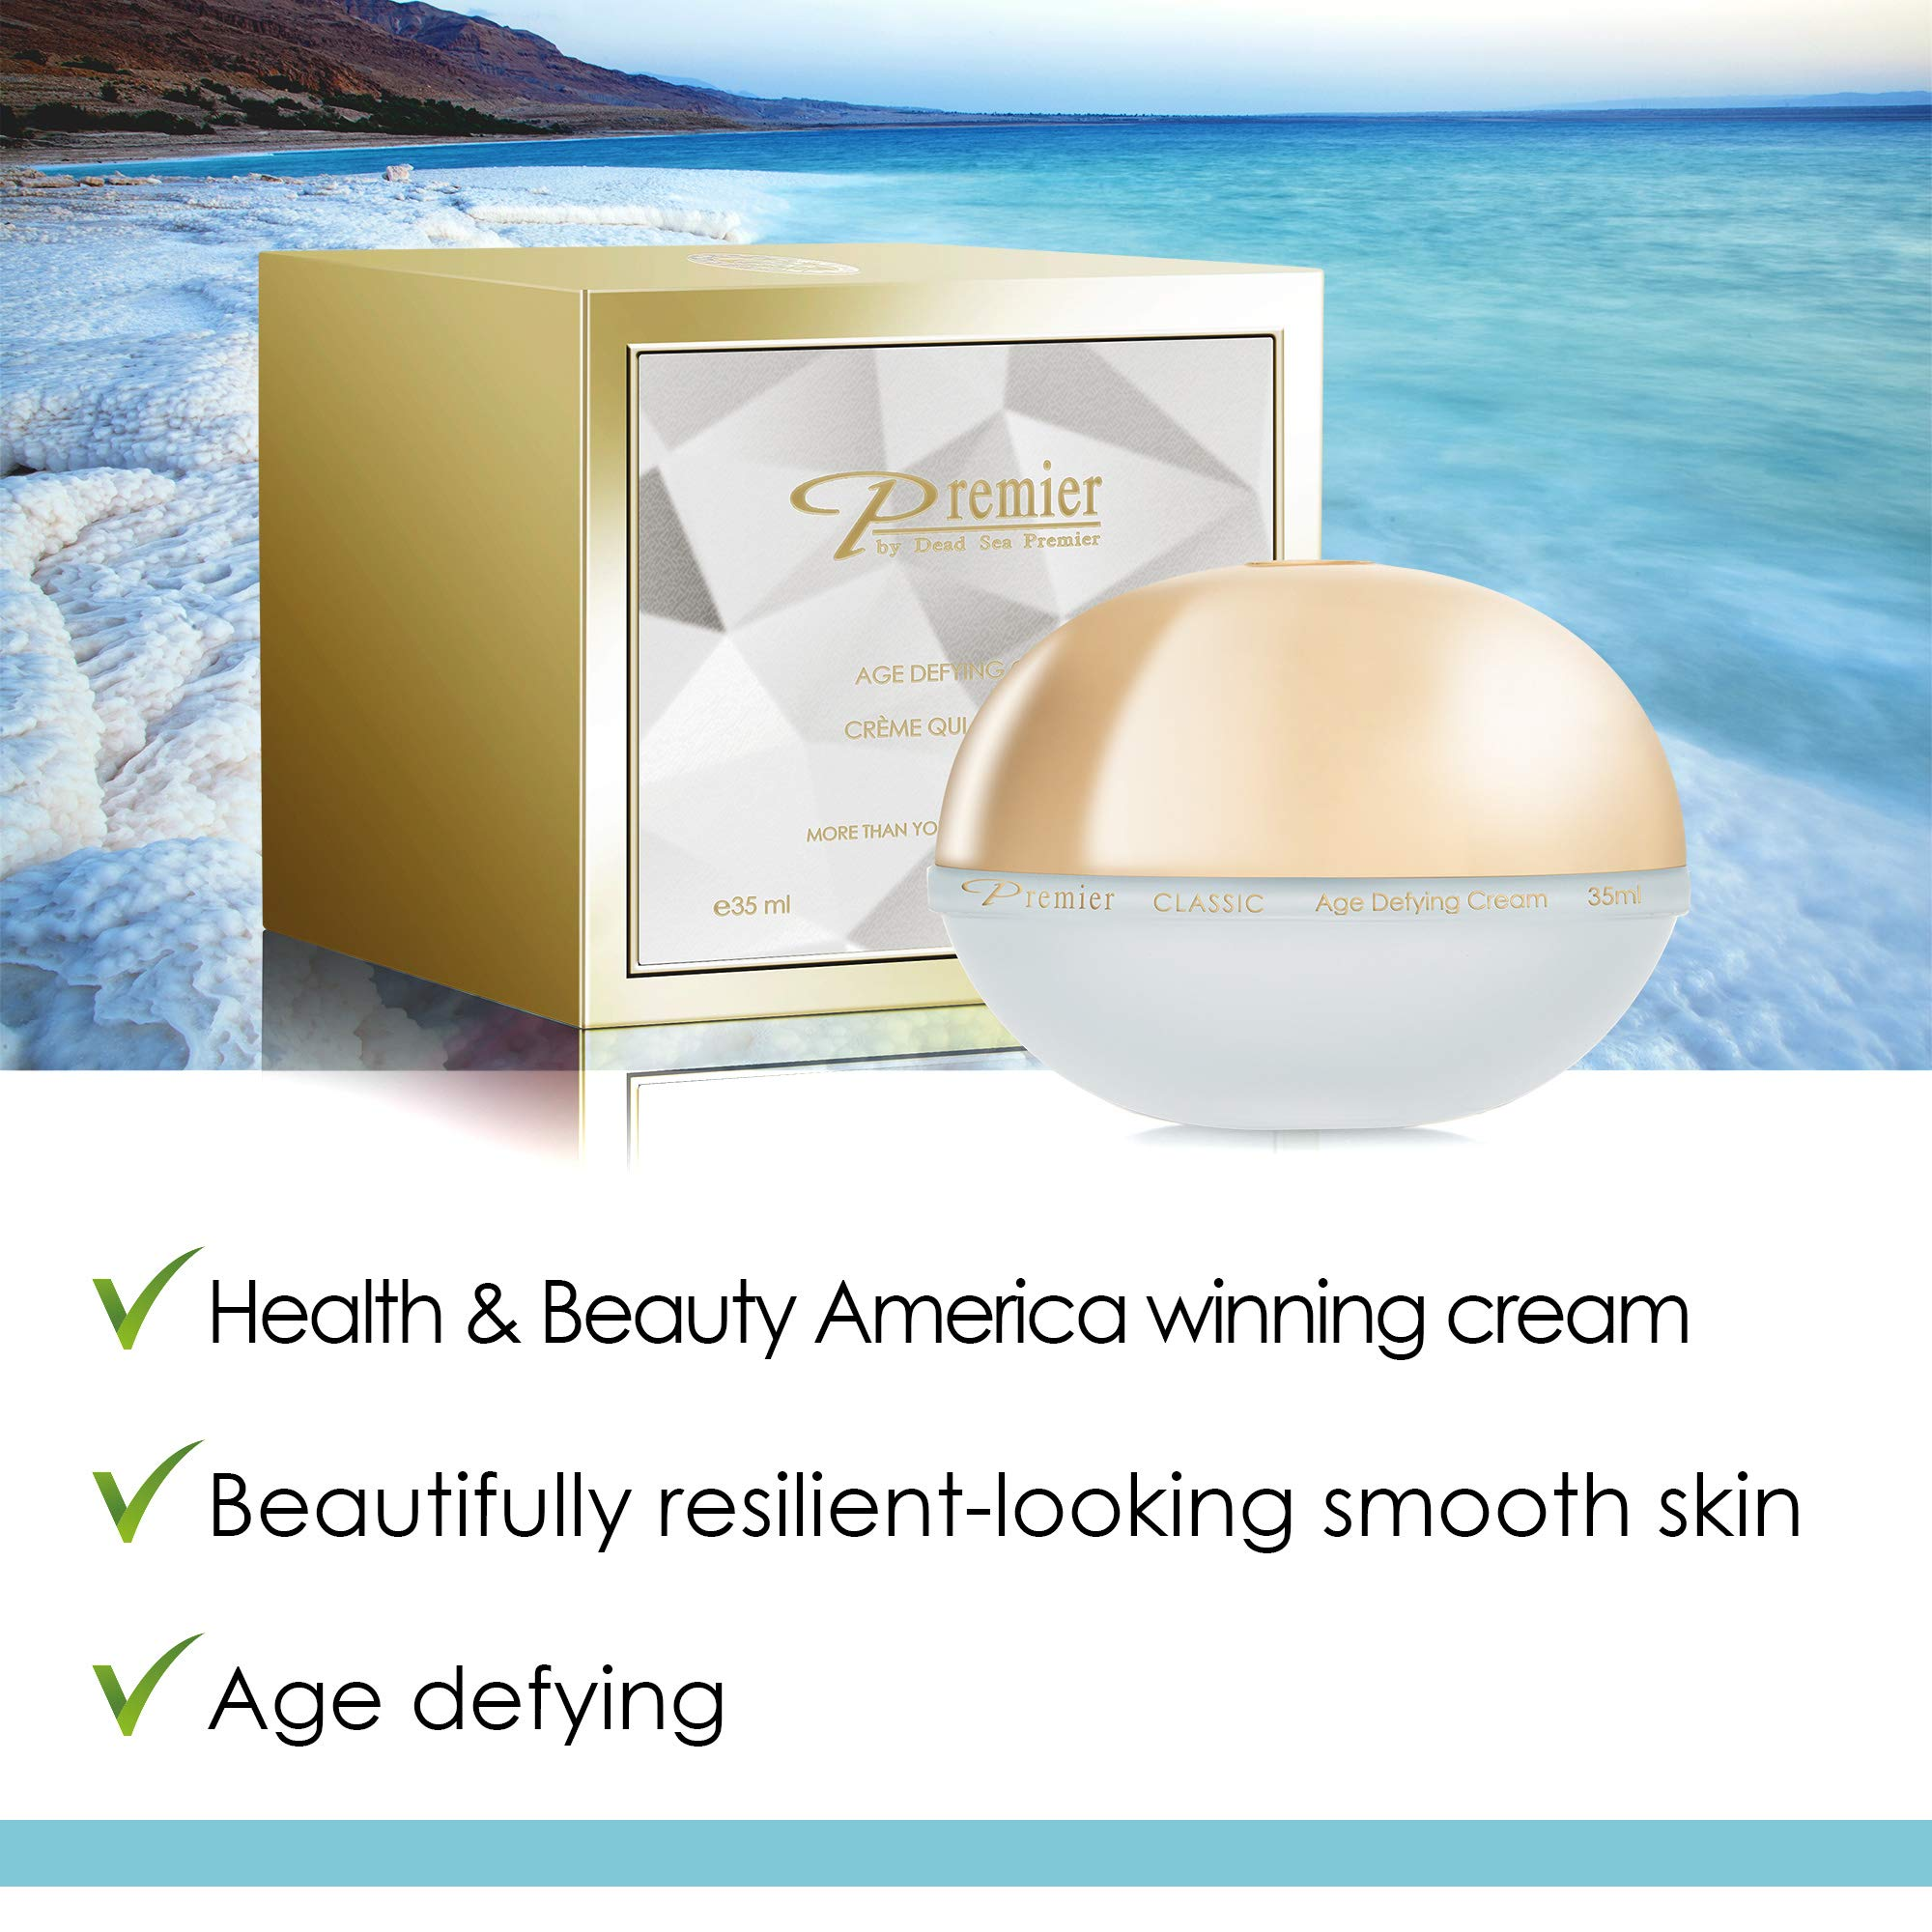 Premier Dead Sea Classic Age Defying Anti Age Cream, Reduce wrinkles by Premier by Dead Sea Premier (Image #2)